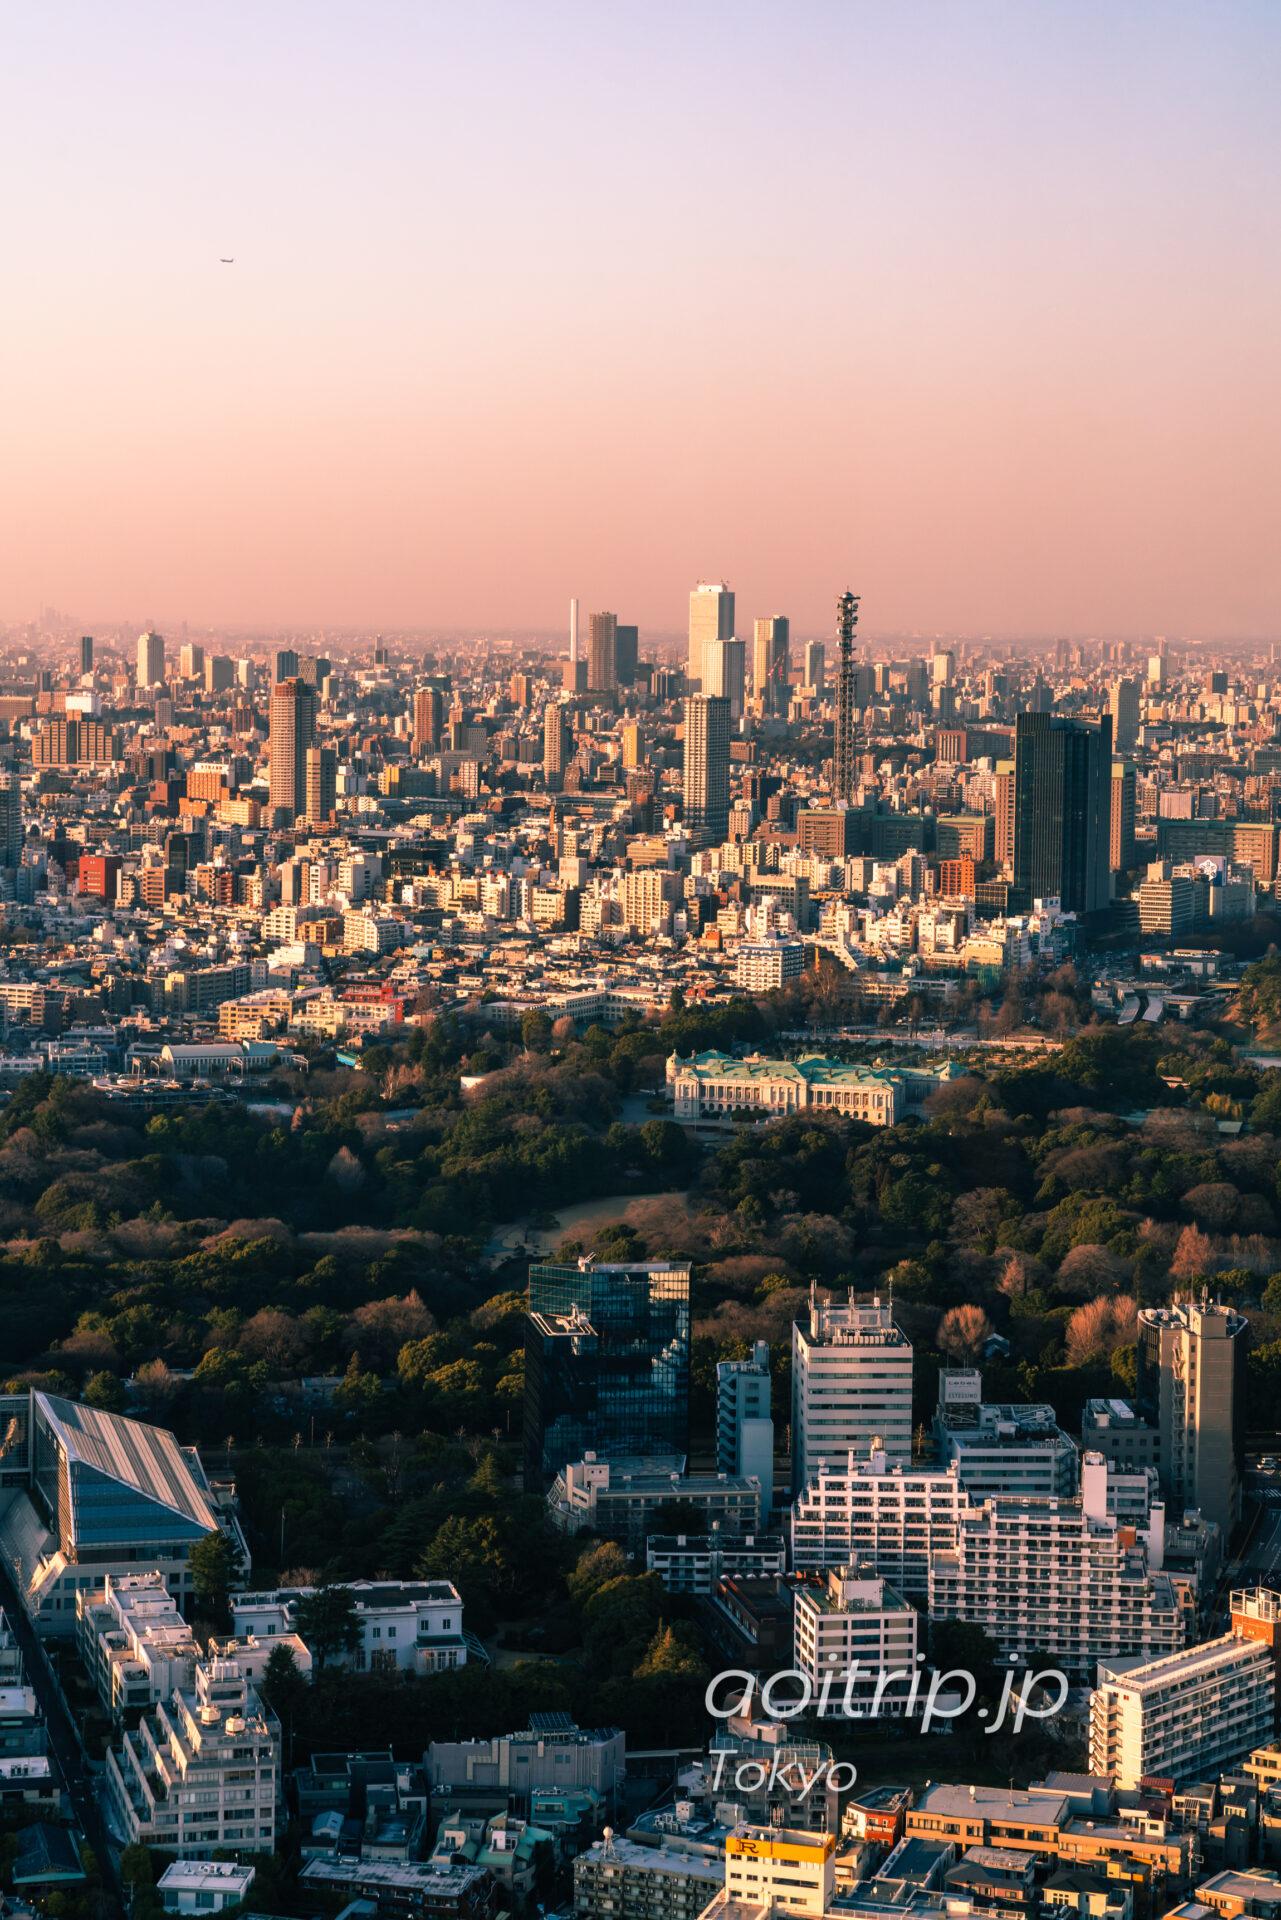 Tokyo Skyline ザ リッツカールトン東京から望む新宿副都心と池袋